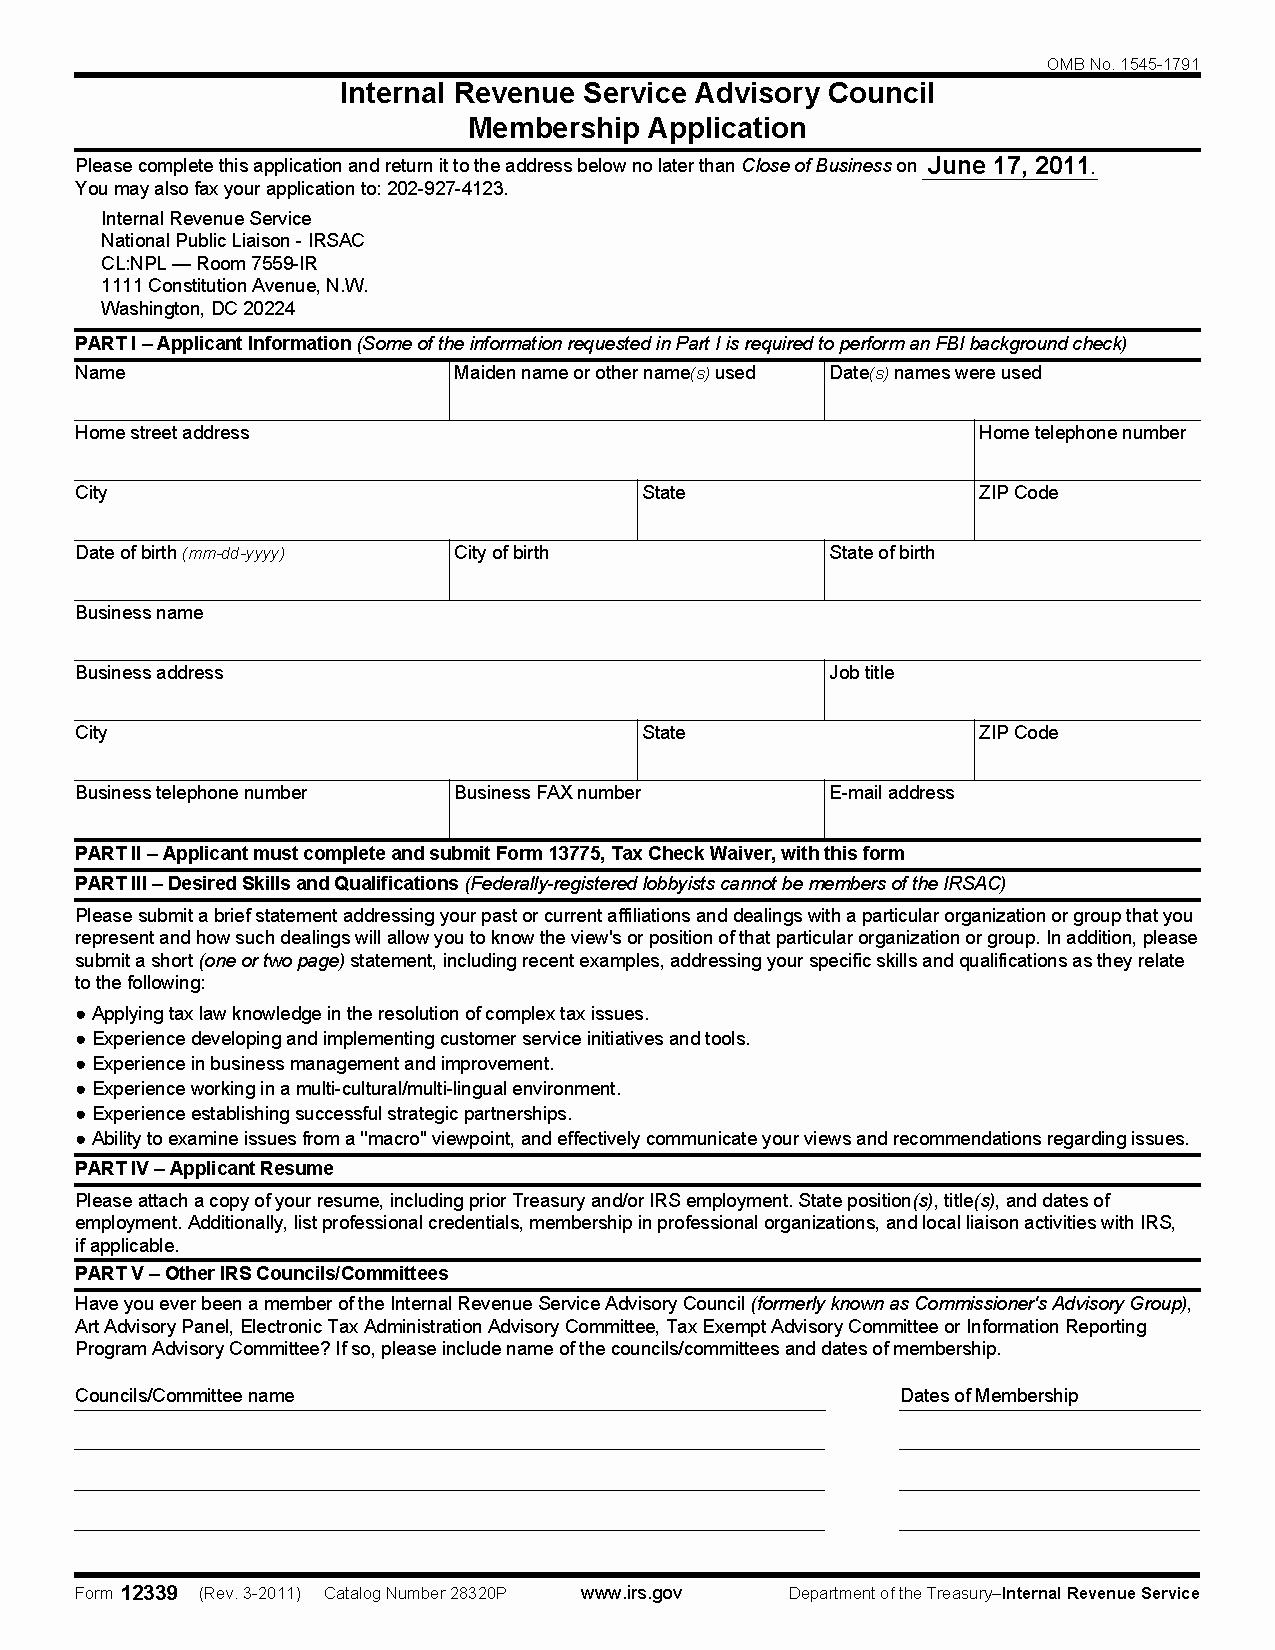 Internal Application form Elegant form Internal Revenue Service Advisory Council